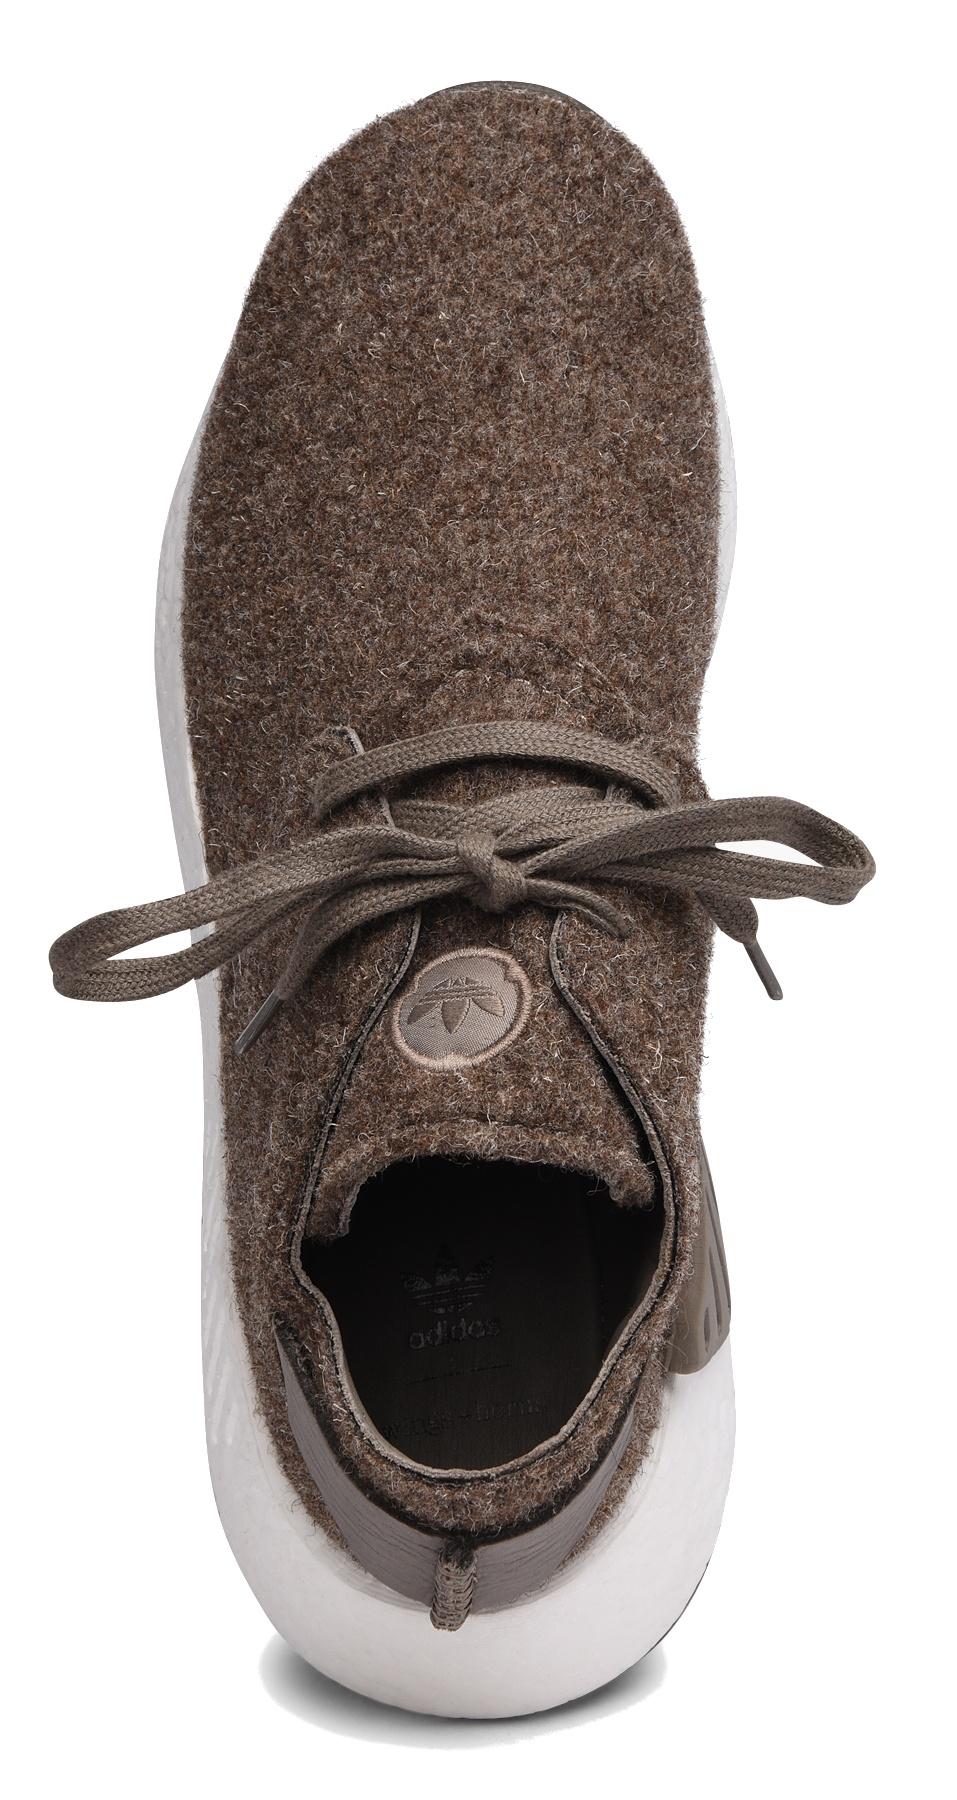 807de204040c8 adidas sneakers WH NMD C2 Chukka unisex brown - Internet-Sport Casuals